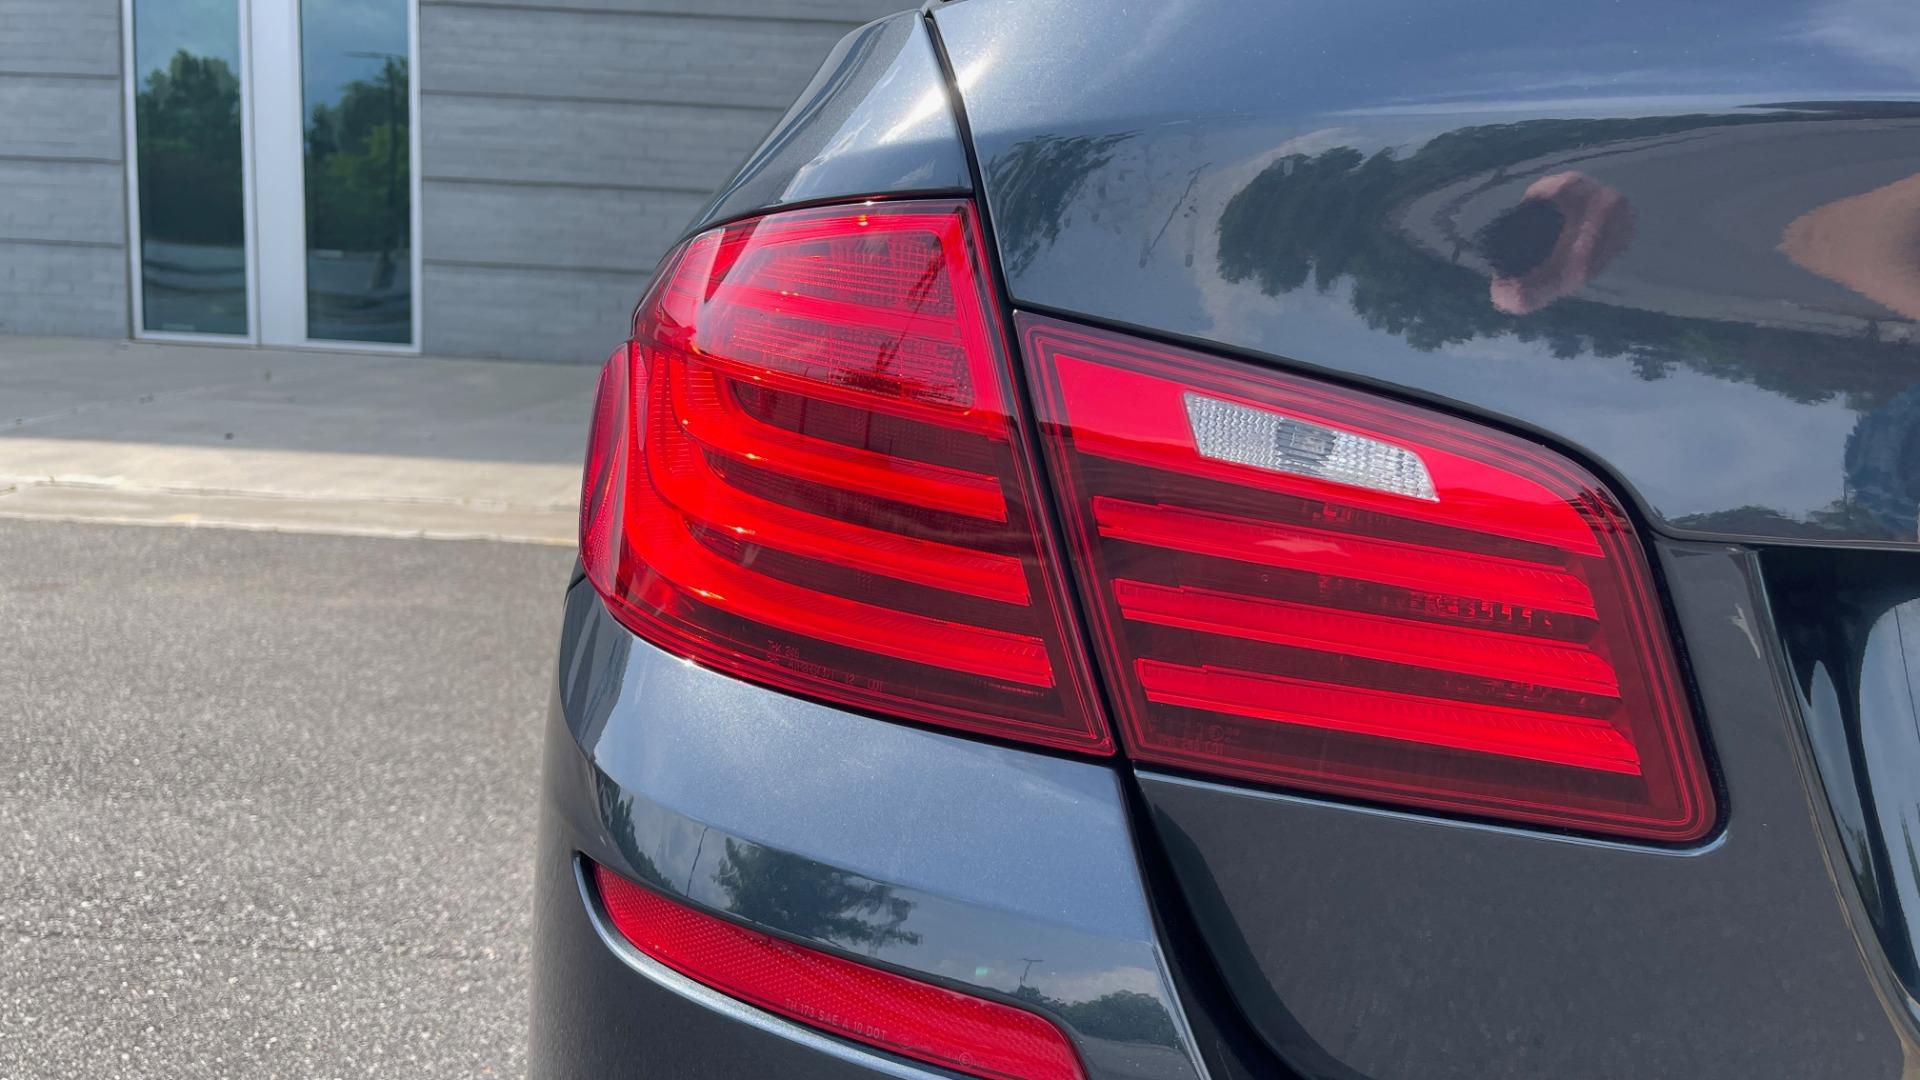 Used 2015 BMW M5 SEDAN / EXEC PKG / HUD / NAV / B&O SND / SUNROOF / REARVIEW for sale Sold at Formula Imports in Charlotte NC 28227 30